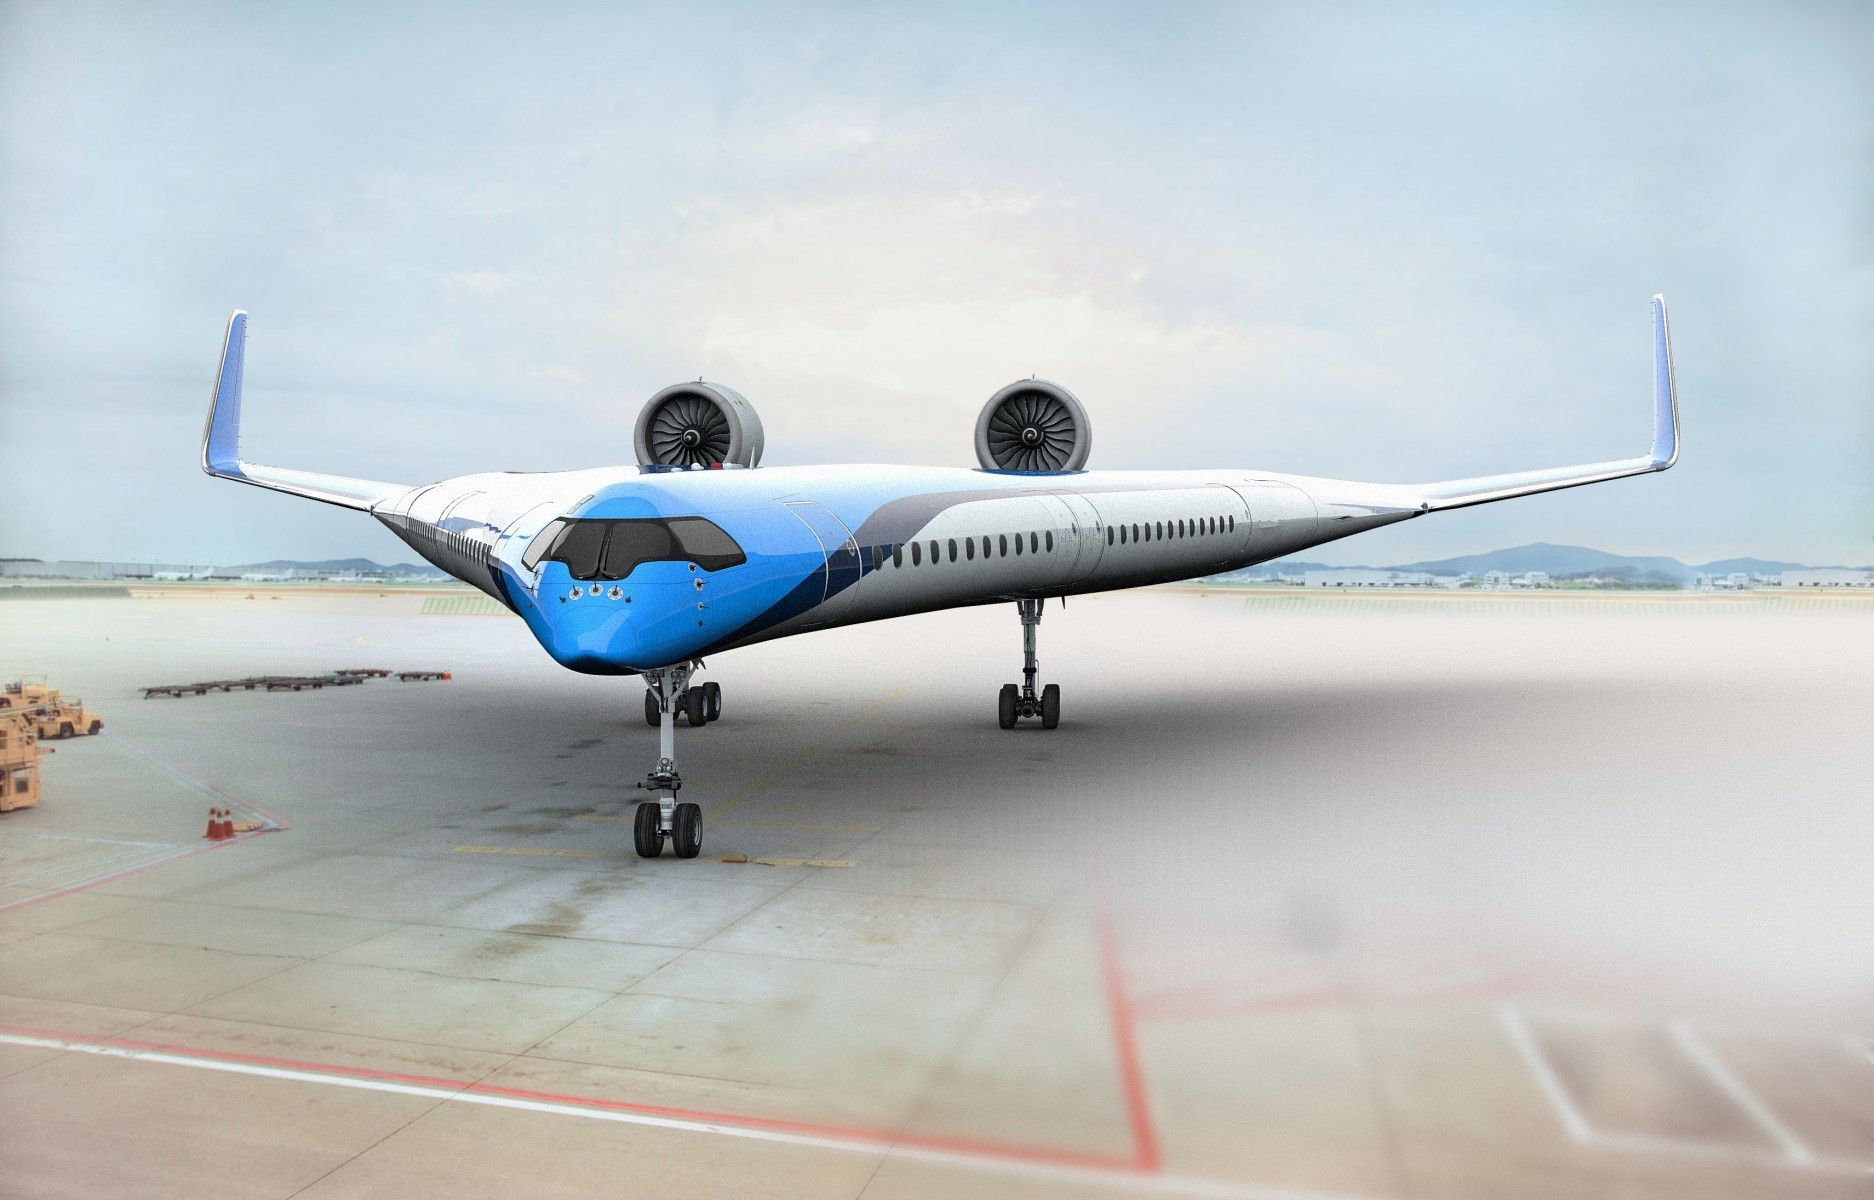 KLM打造V型省油减碳飞机 可节省20%油耗